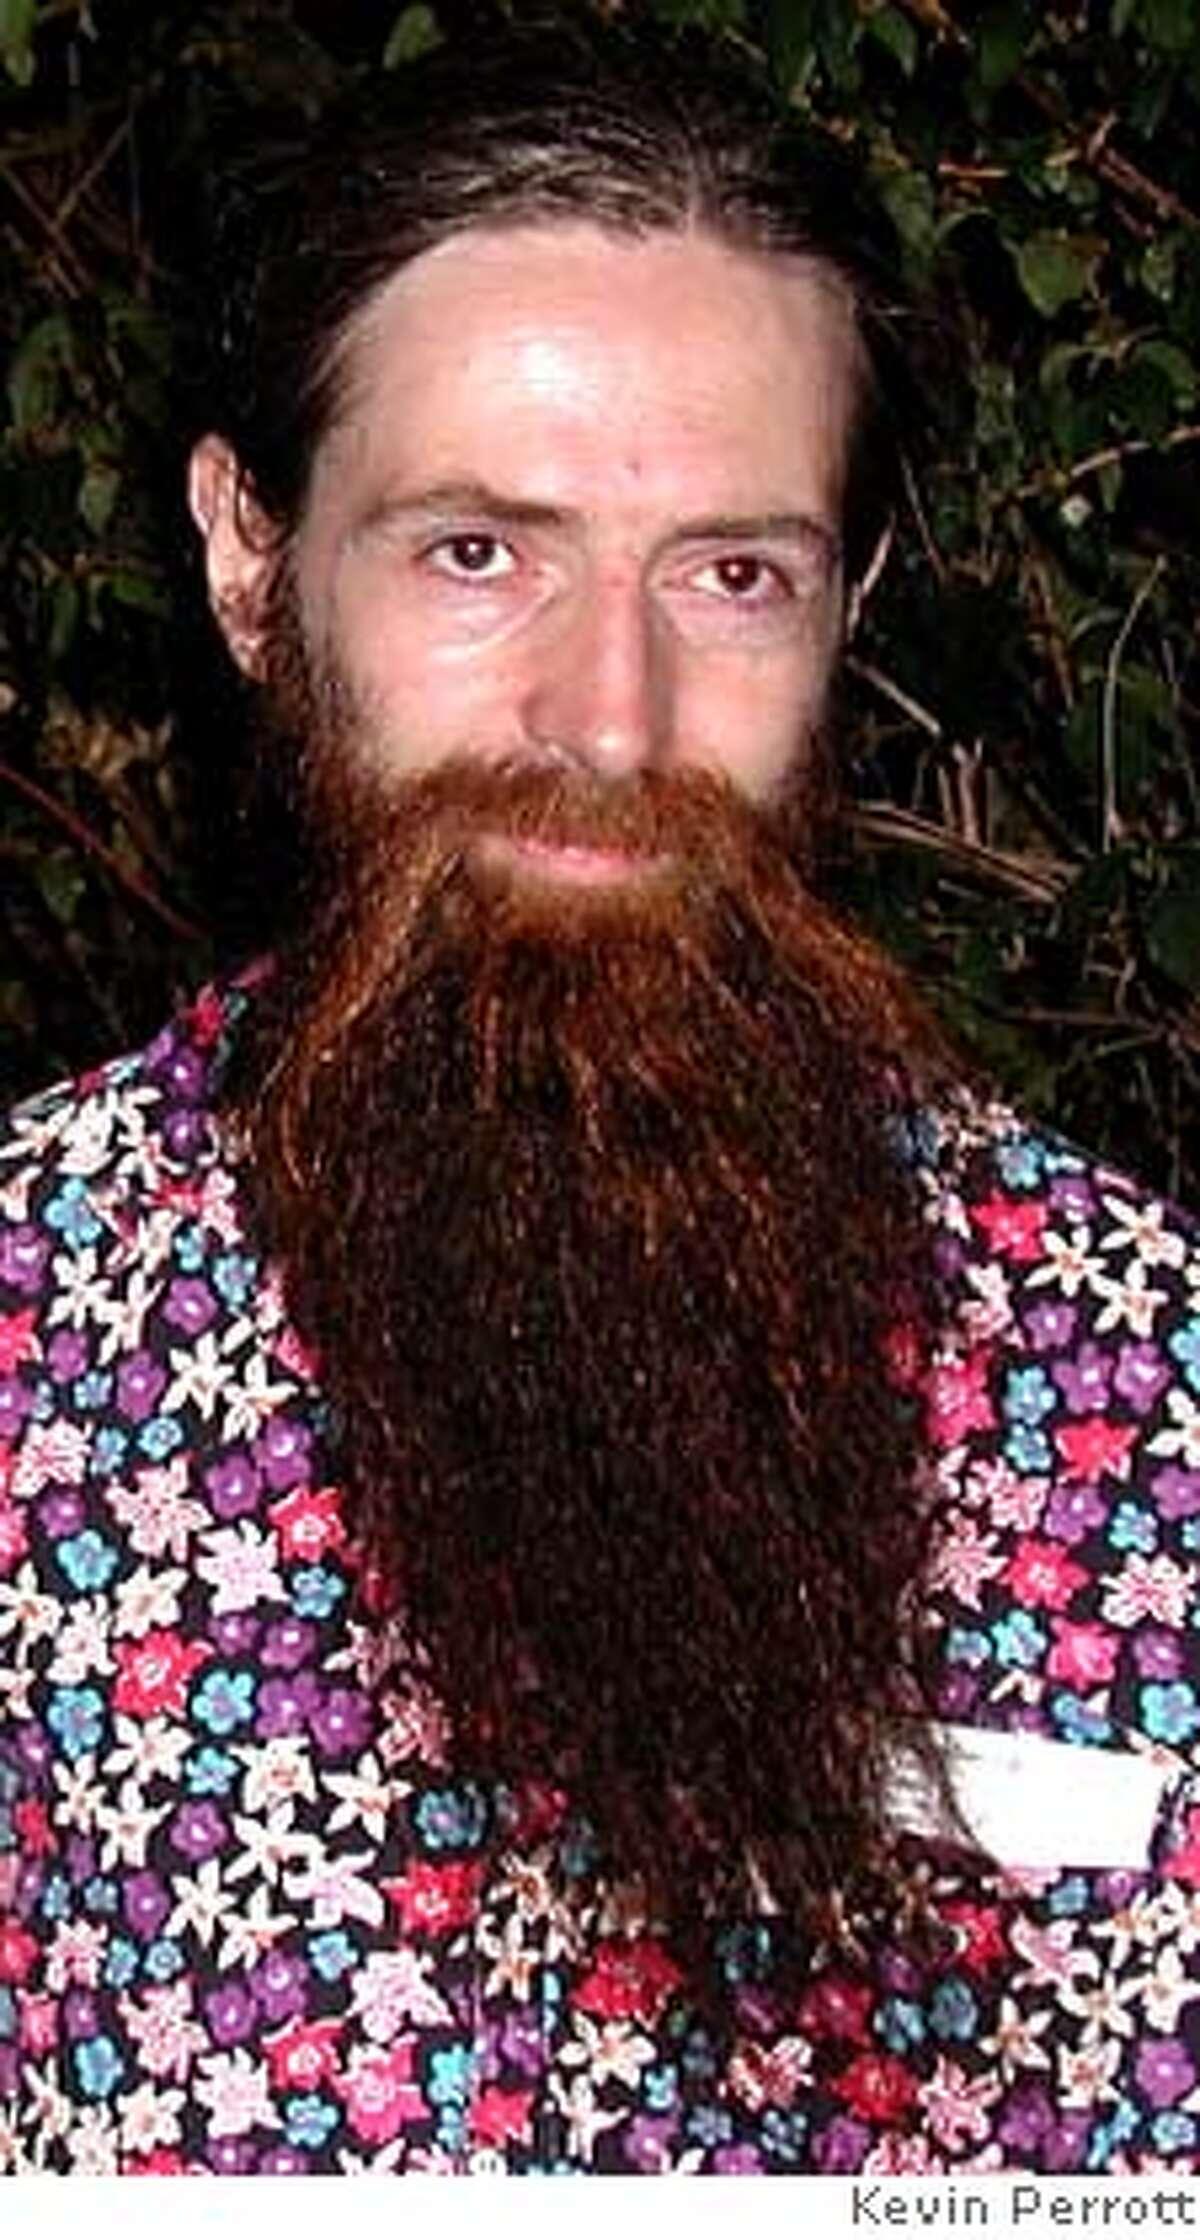 LIVEFOREVER17-- Aubrey de Grey. CREDIT: Kevin Perrott/Handout photo.